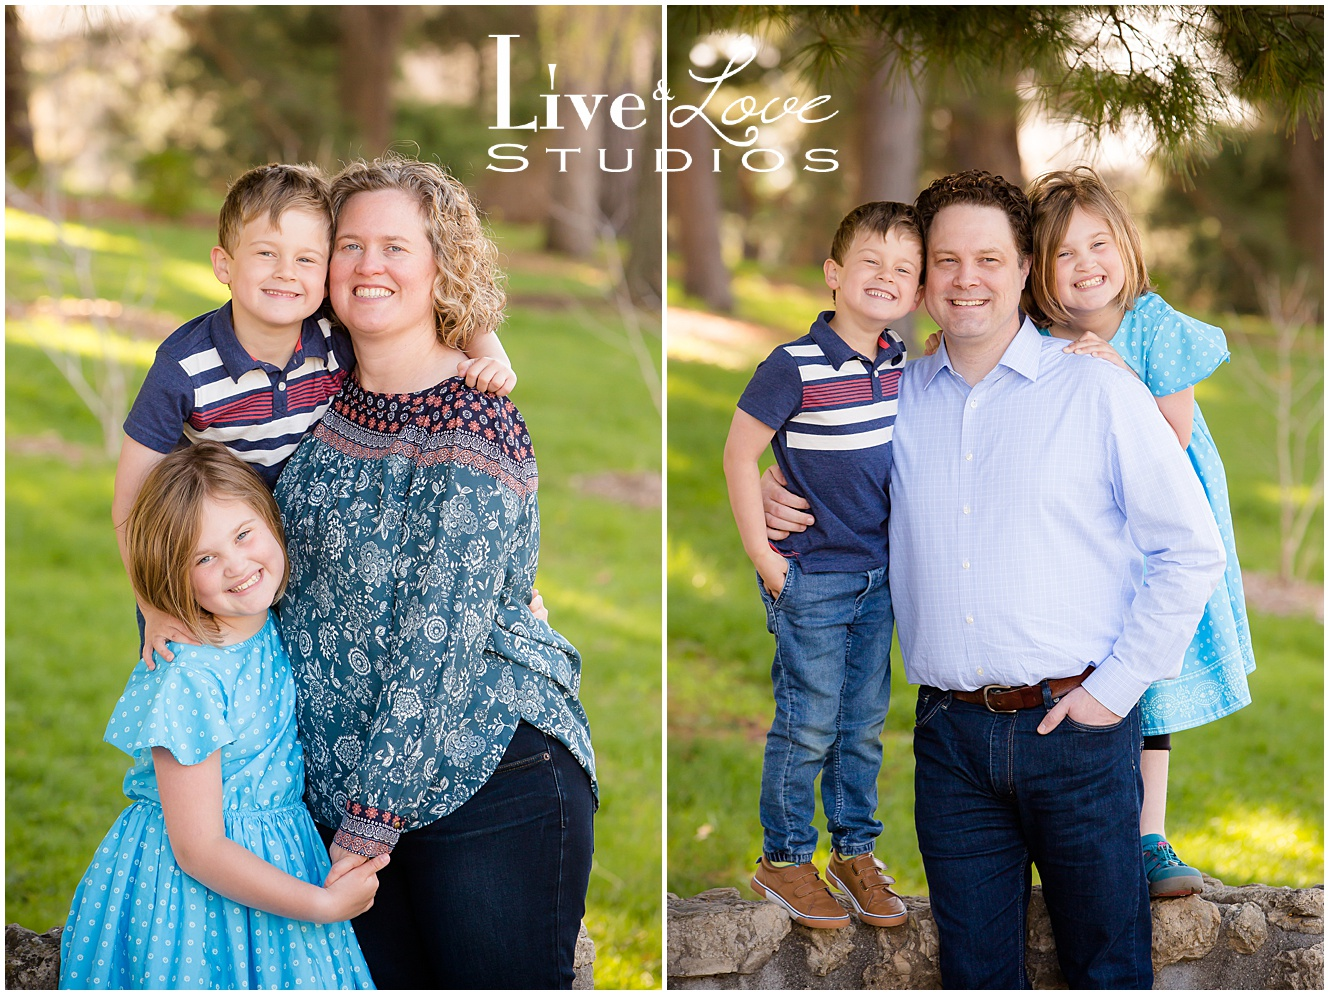 st-paul-mn-family-photographer-2019_0043.jpg